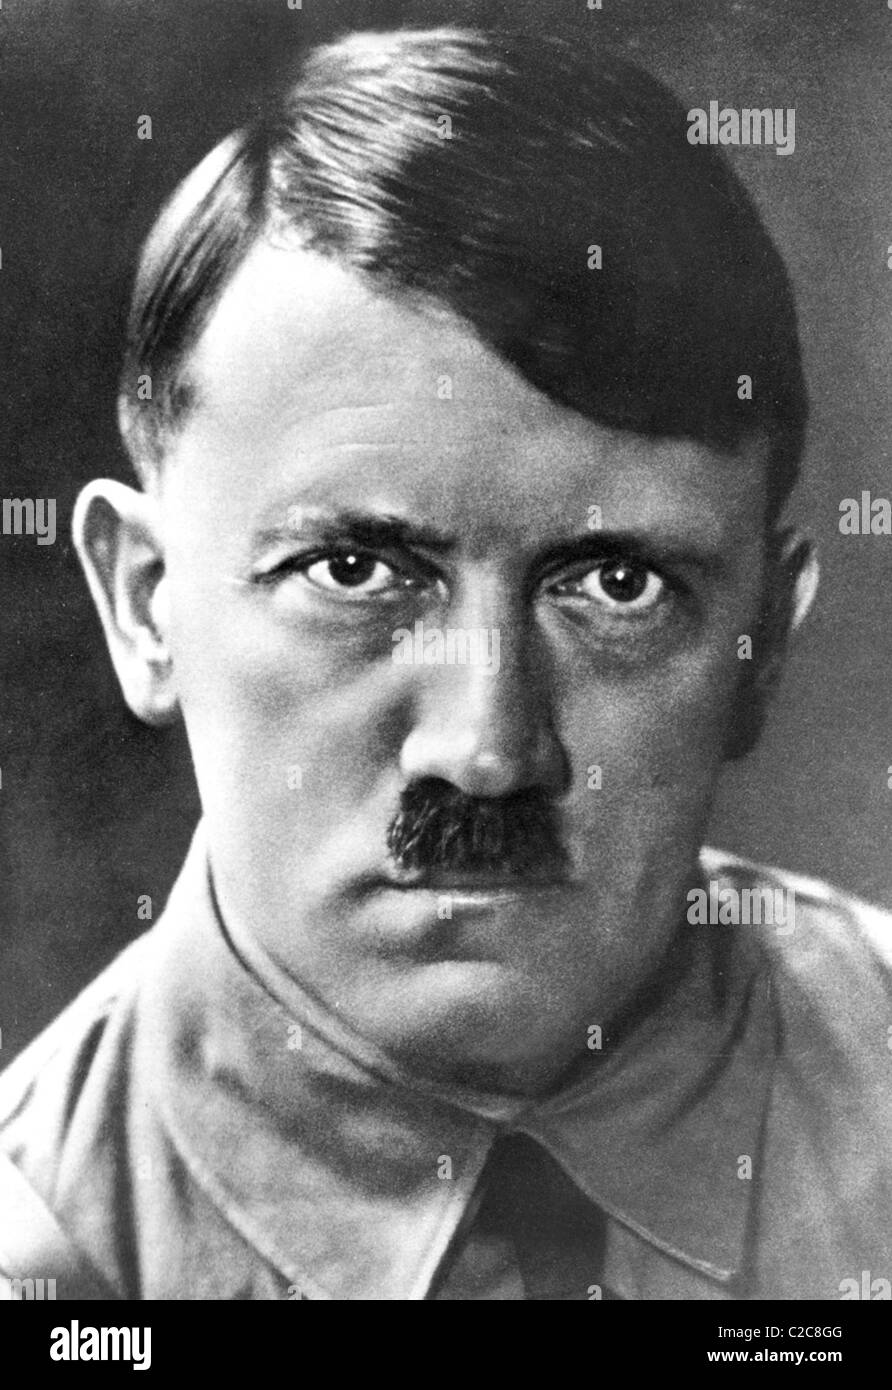 Adolf Hitler German wartime leader - Stock Image